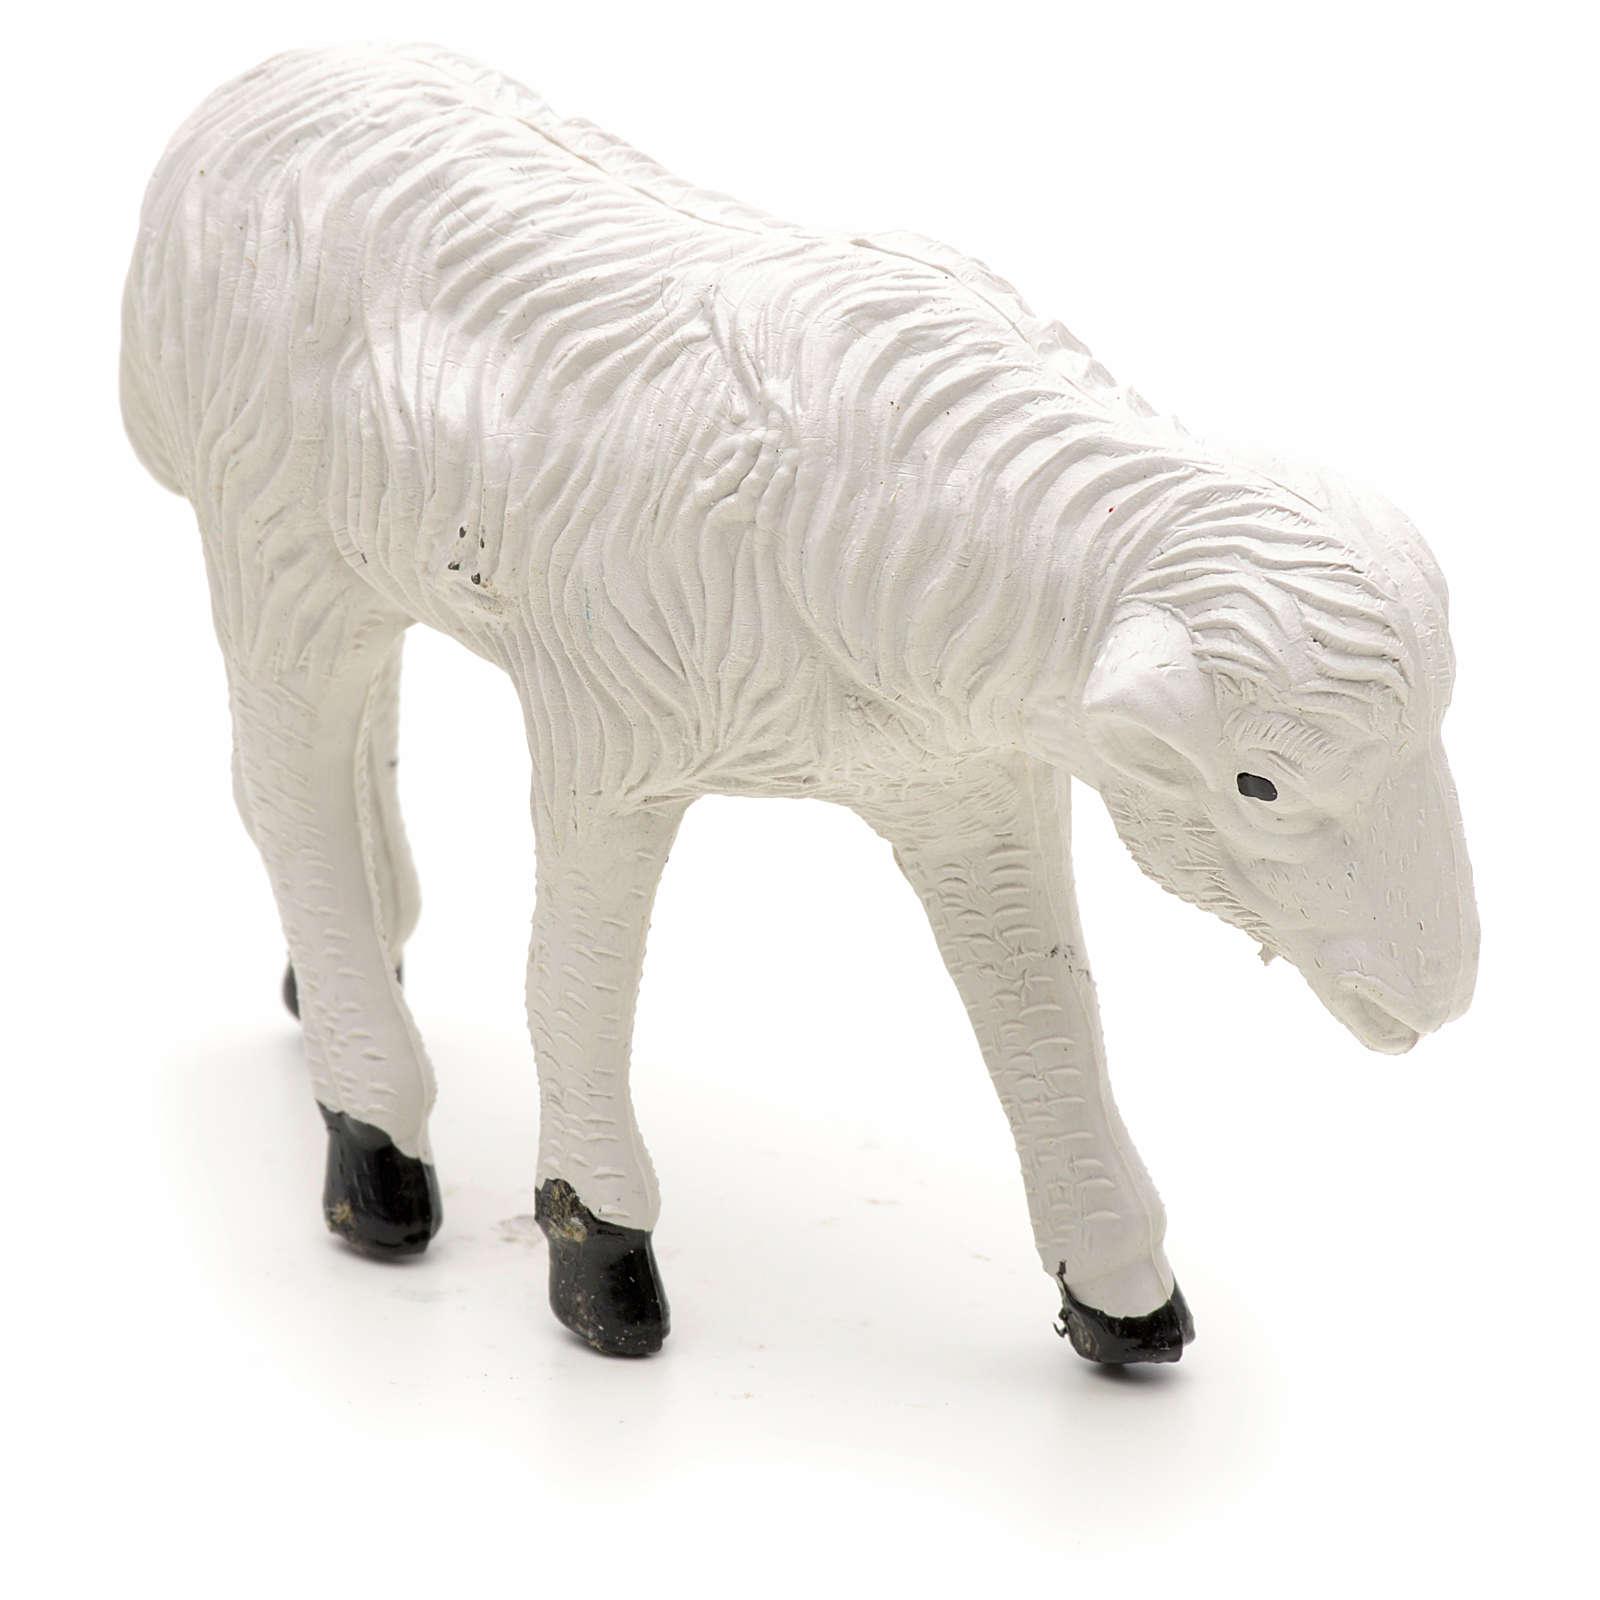 Nativity figurine, sheep measuring 9x6cm 3